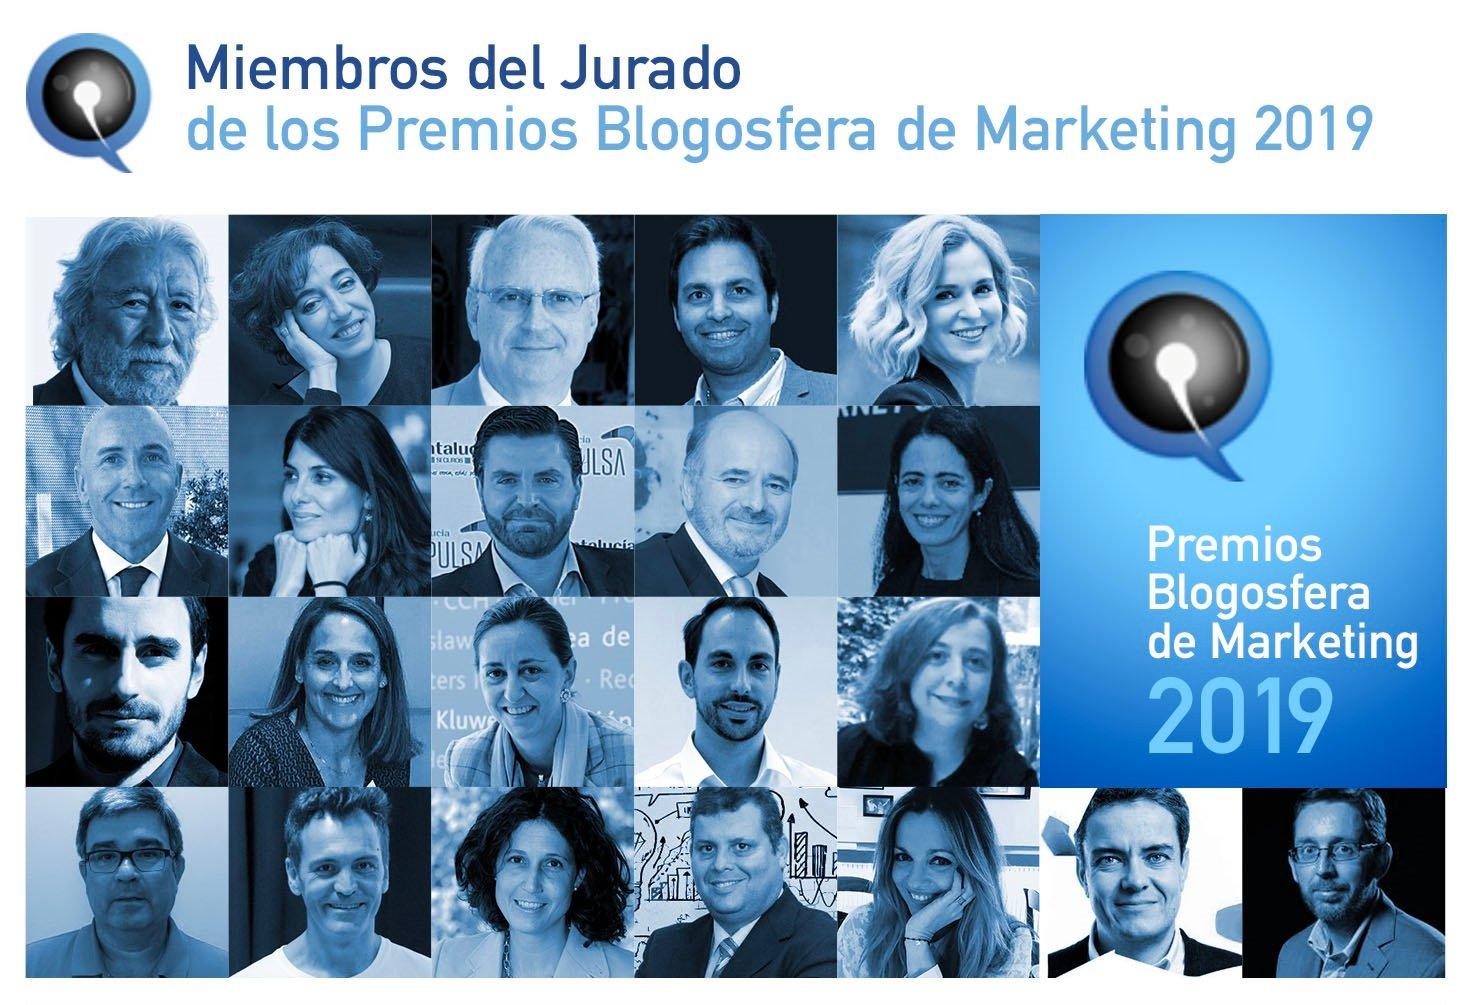 Premios Blogosfera de Marketing 2019-Fotos Jurado